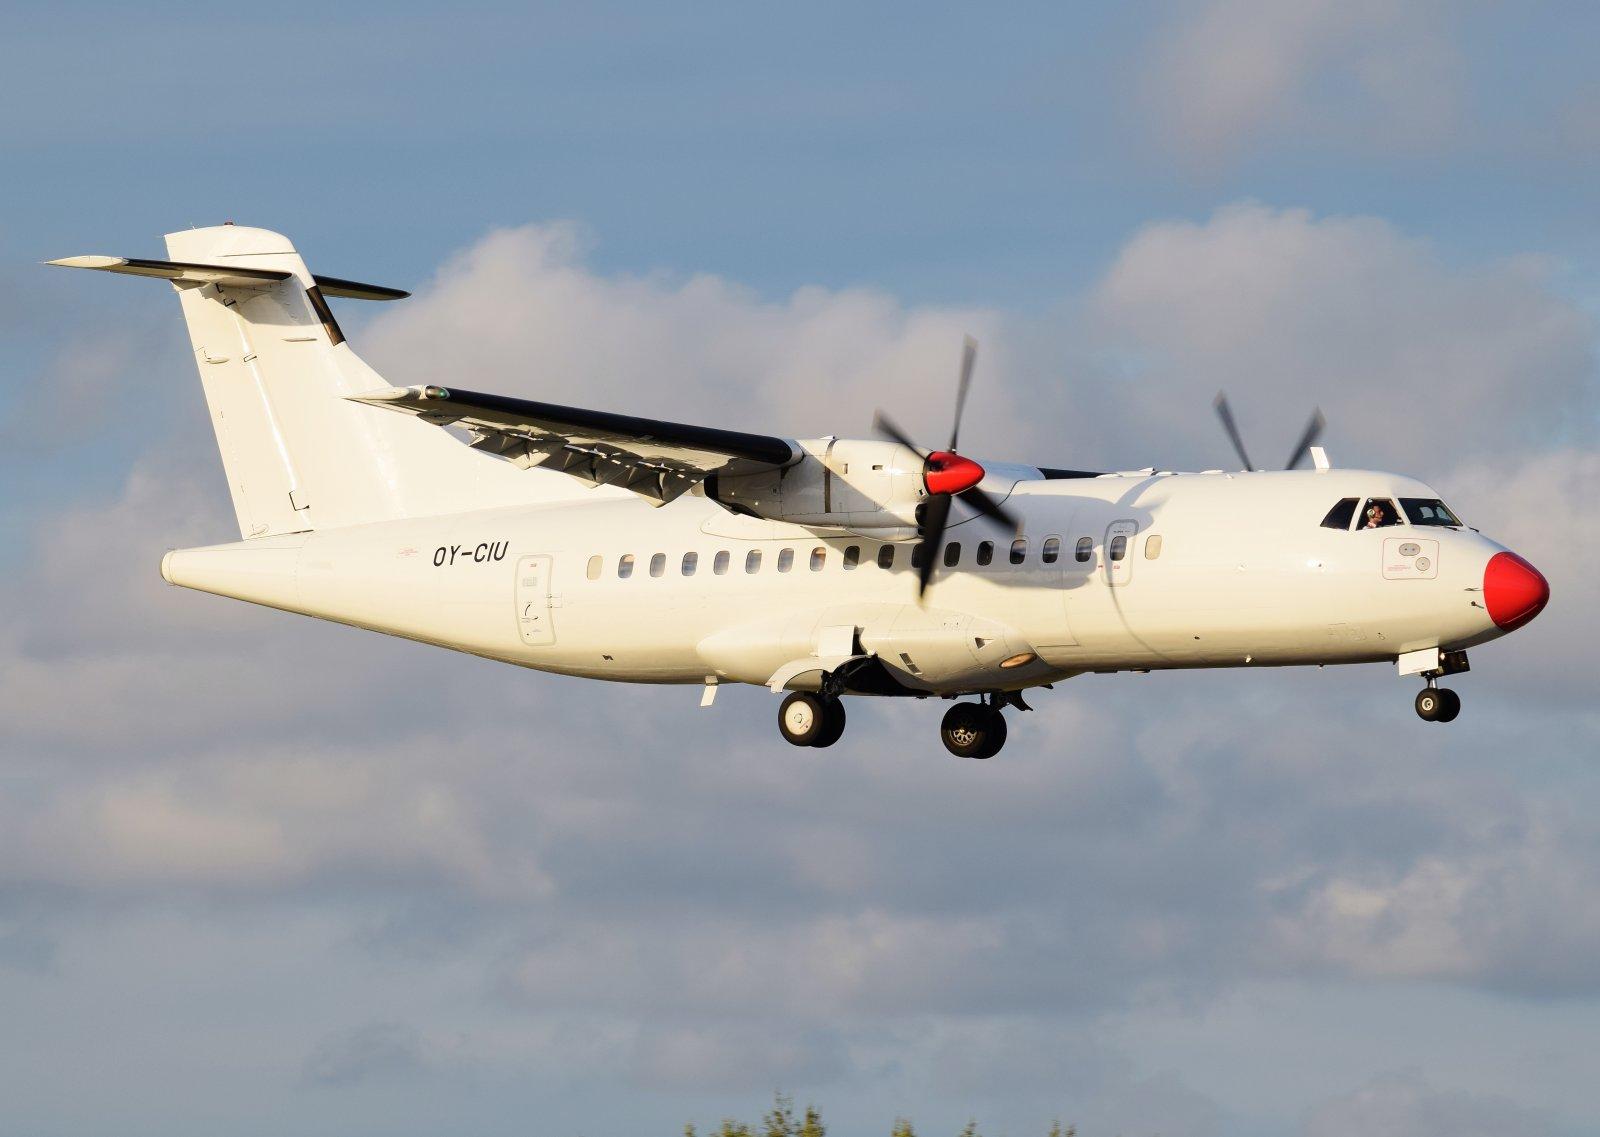 OY-CIU - ATR 42-300 - Danish Air Transport (DAT) - 30.8.2019